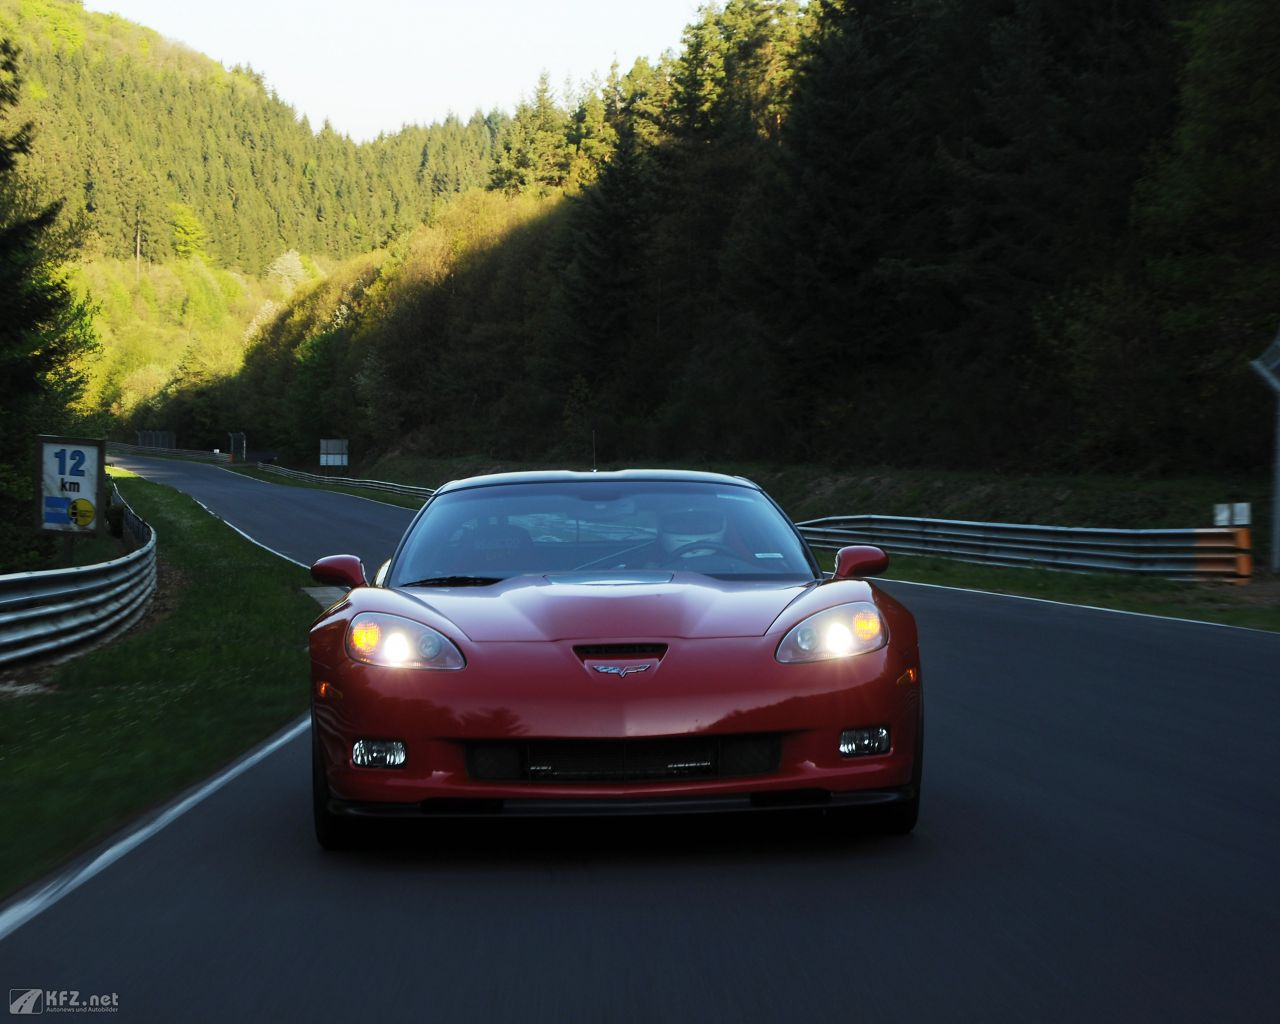 chevrolet-corvette-1280x1024-7